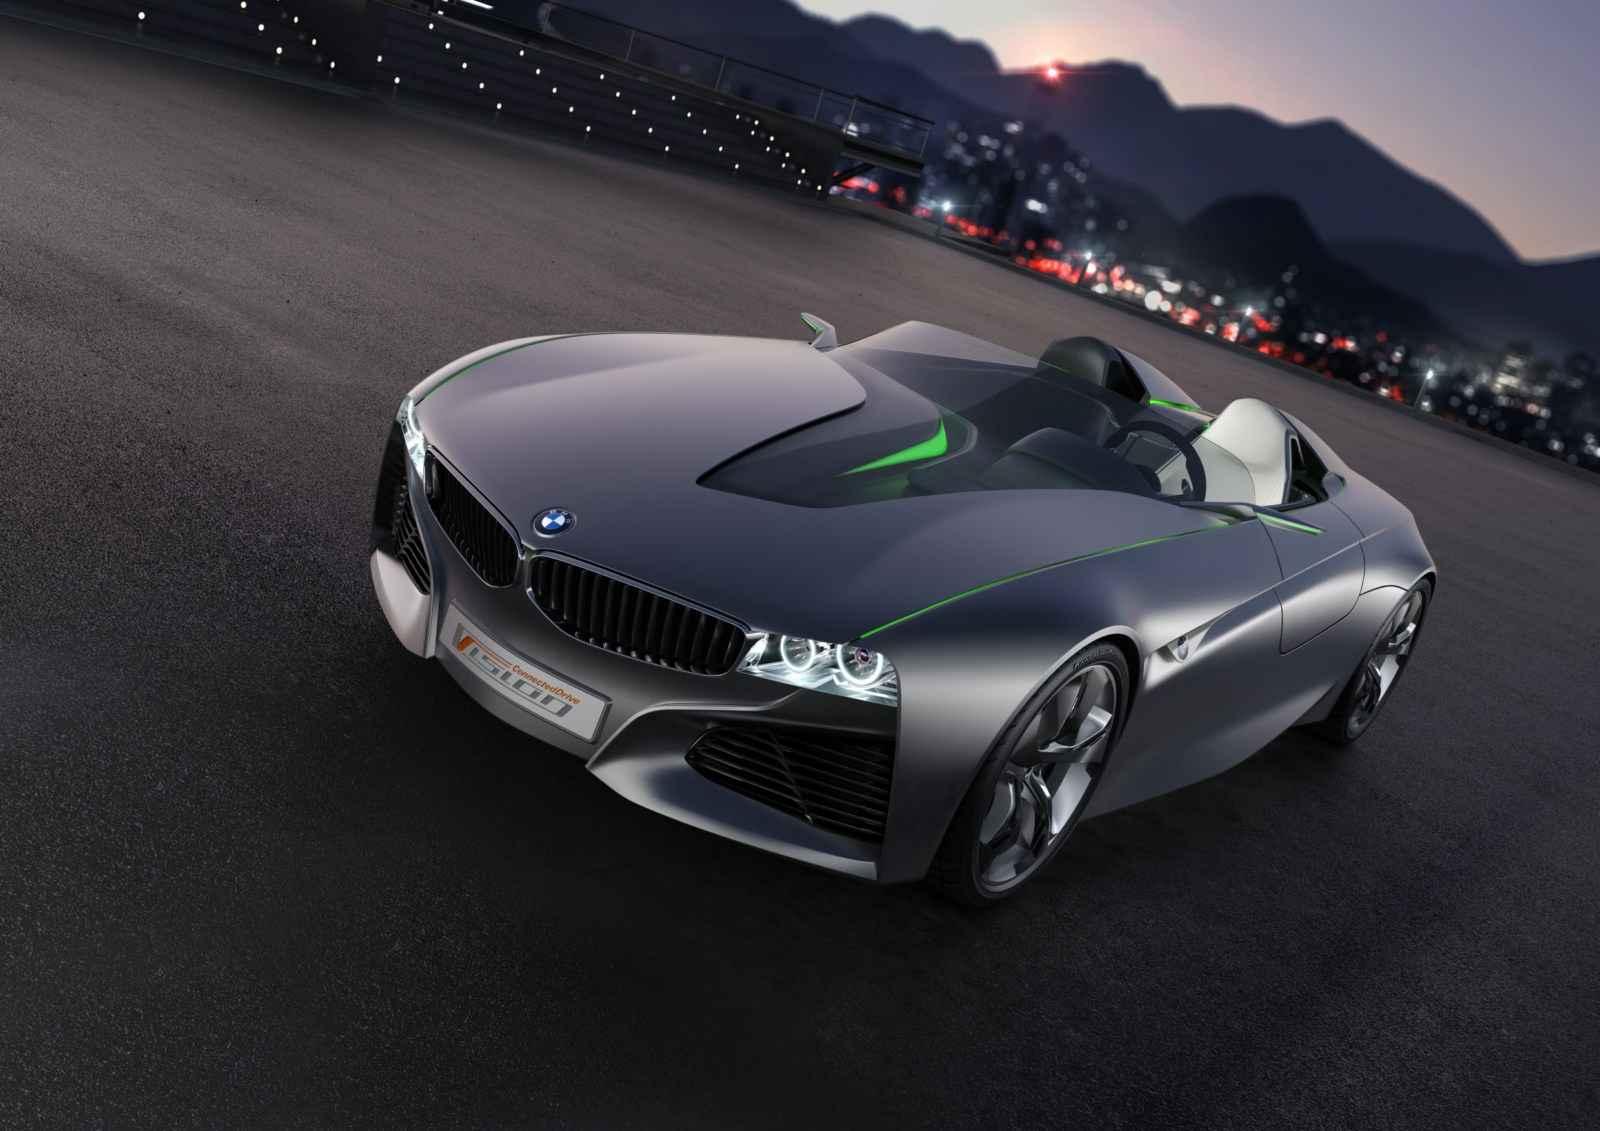 BMW Vision ConnectedDrive Concept Car Genf 2011 081